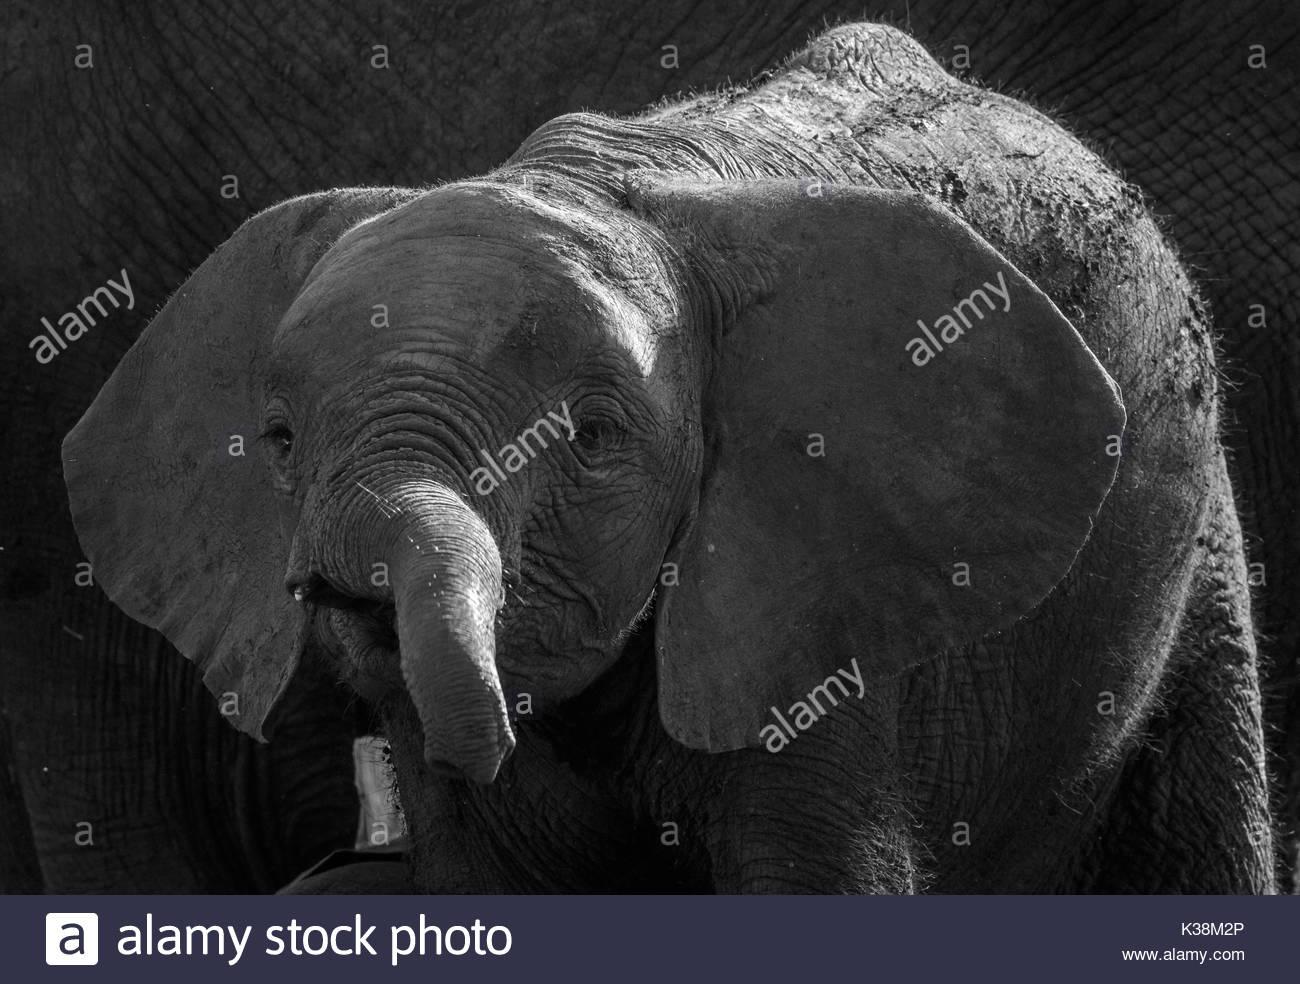 African Elephant in Chobe National Park, Botswana - Stock Image